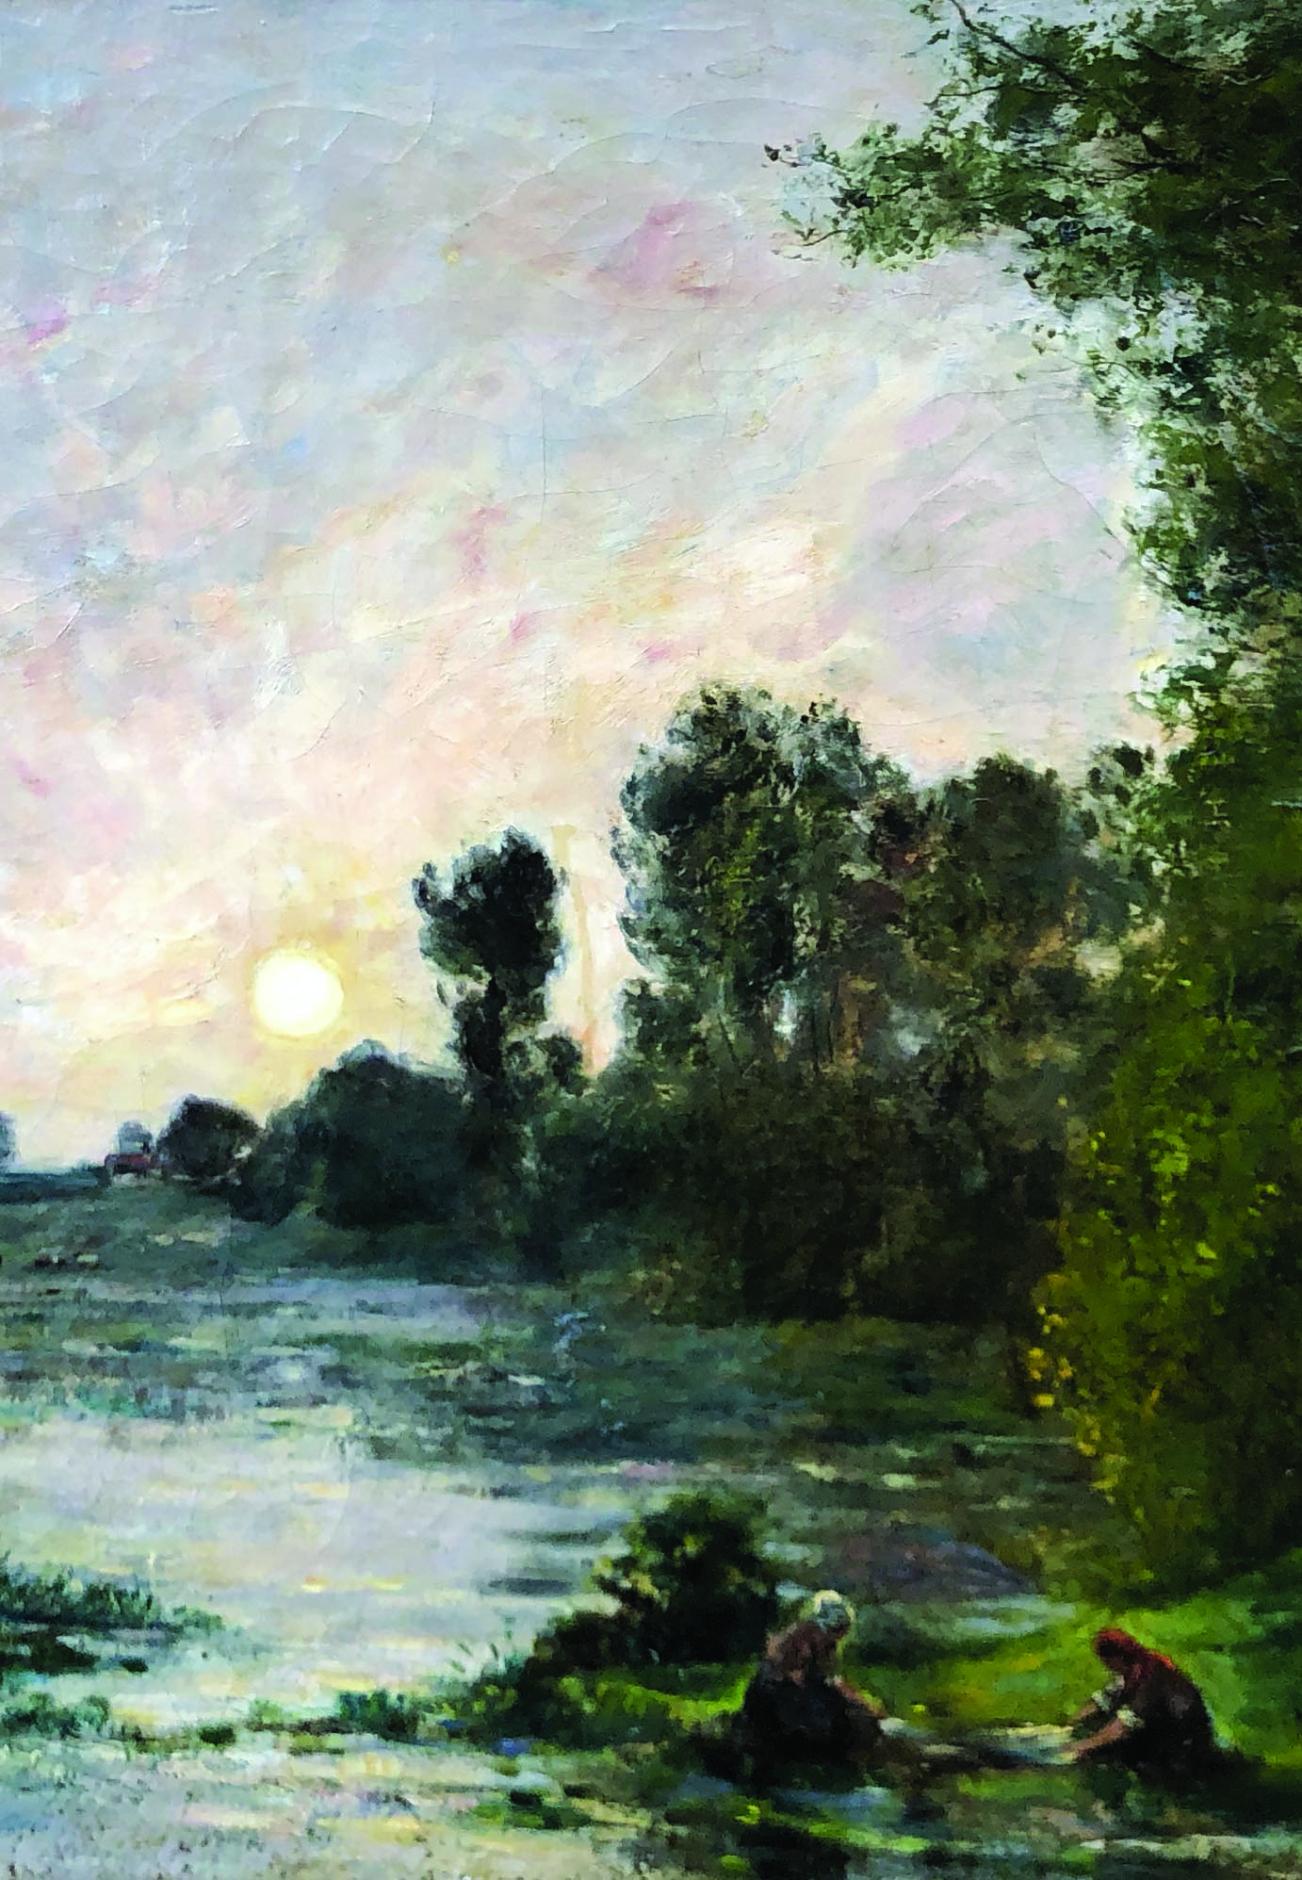 hyppolite-camille-delpy-paysage-huile-sur-toile-circa-1873-collection-privee